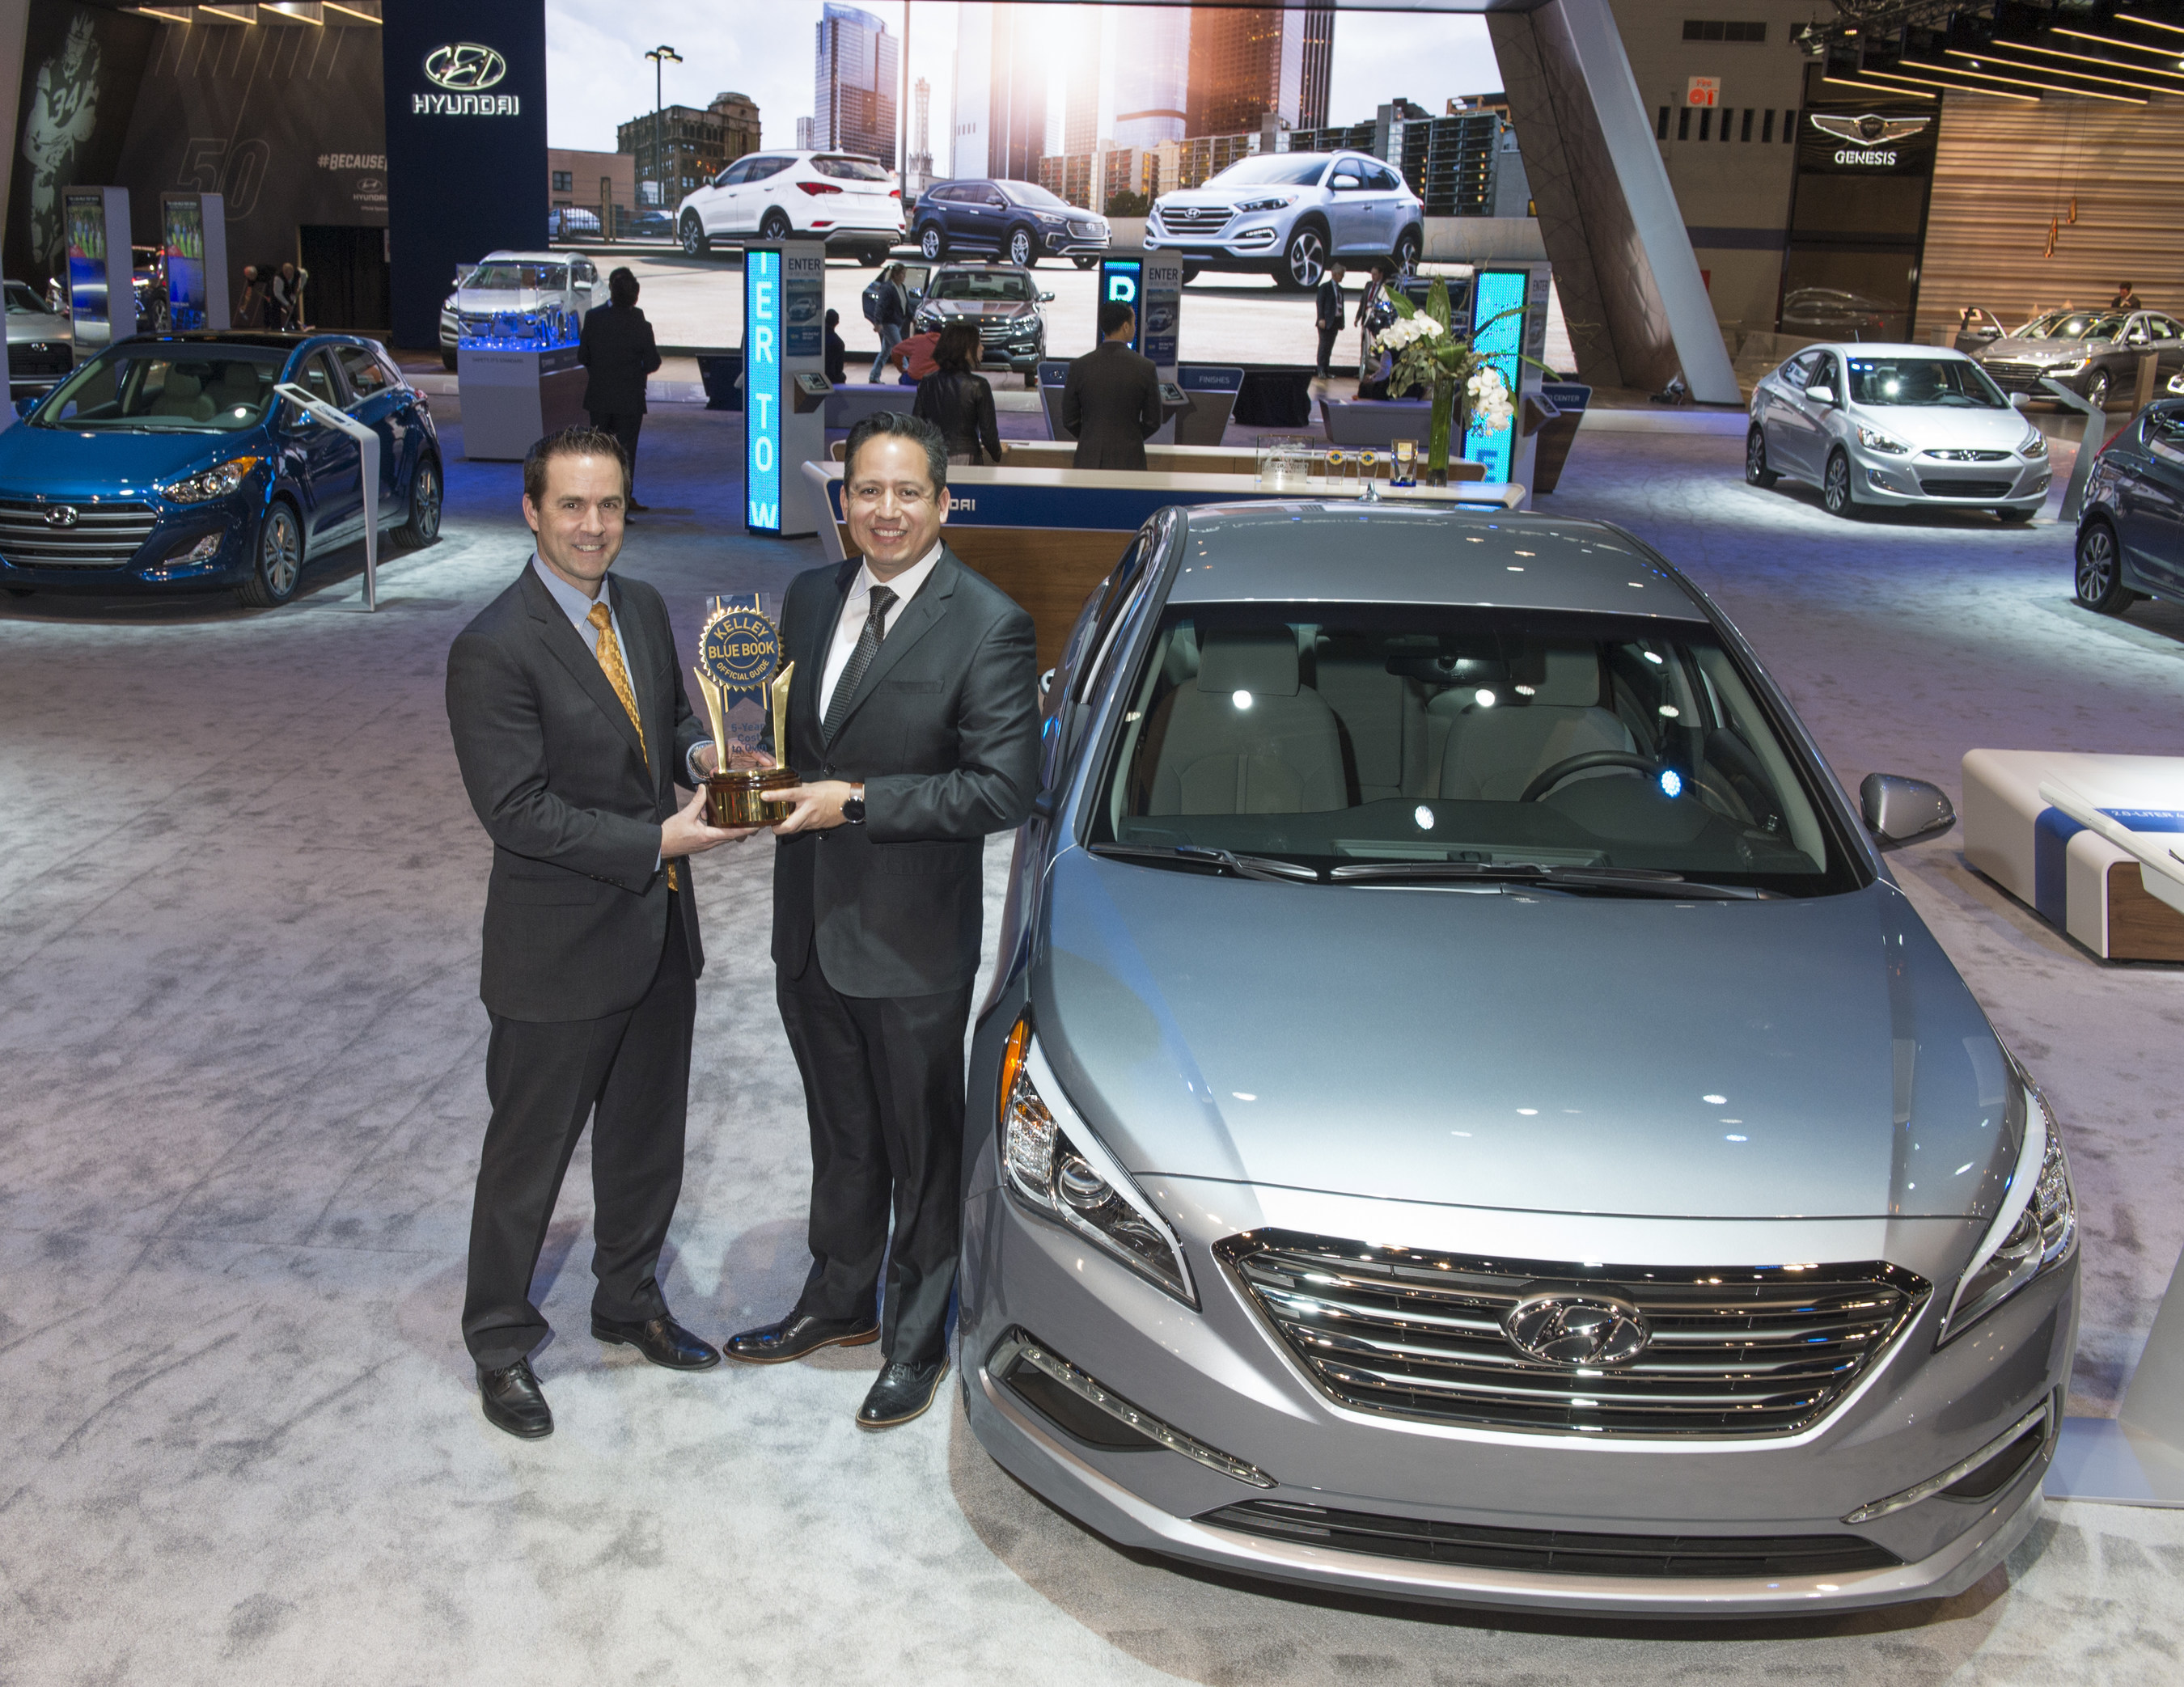 Hyundai Wins Best Brand In Kelley Blue Book 2016 5-Year Cost